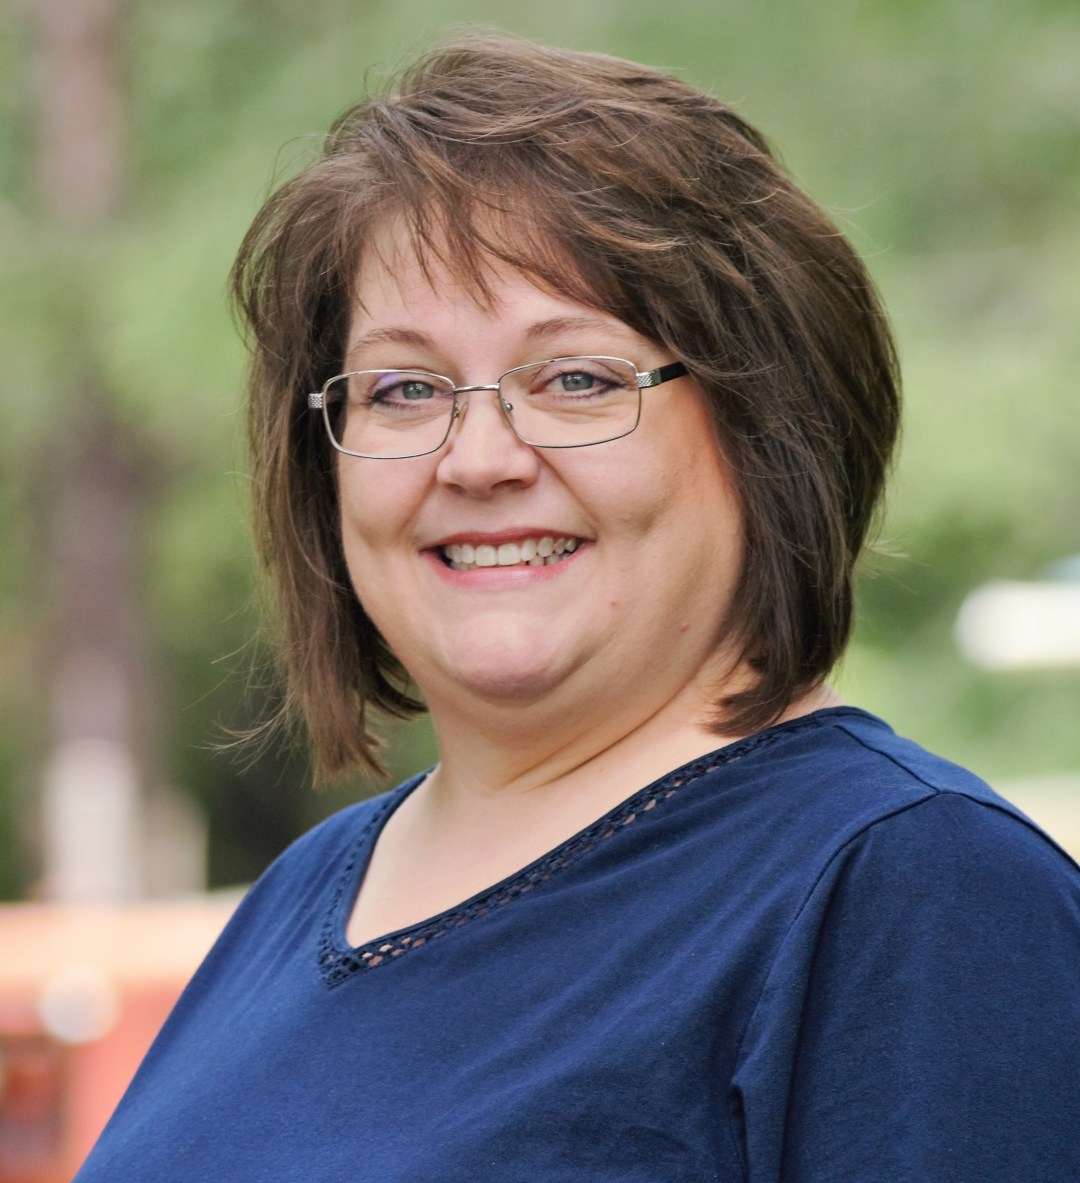 Gwen Hathcock